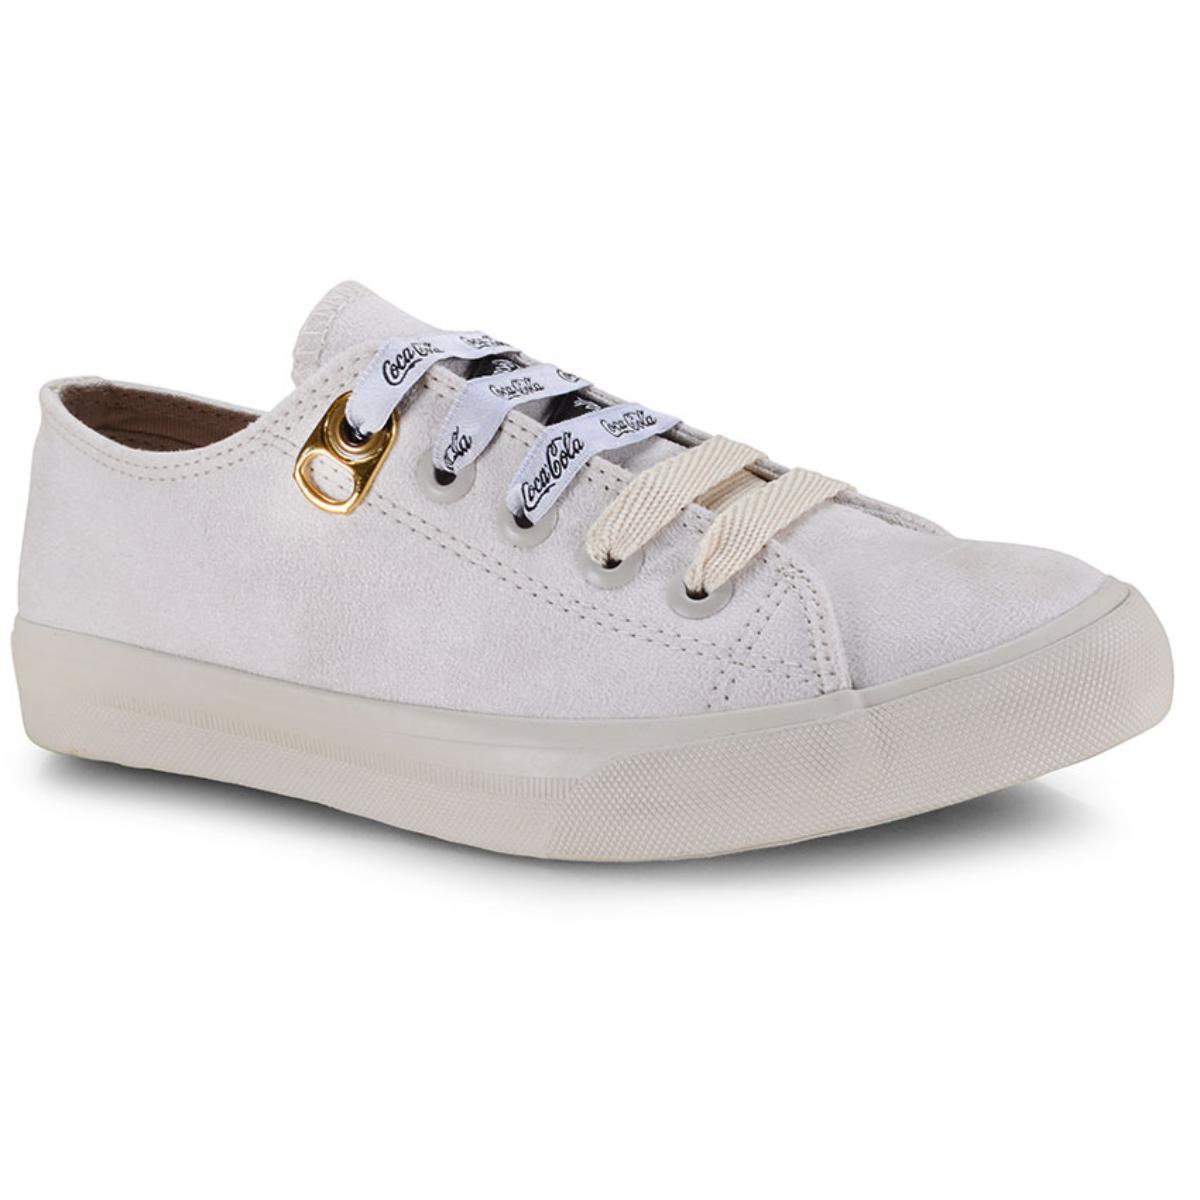 Tênis Feminino Coca-cola Shoes Cc1533 Off White